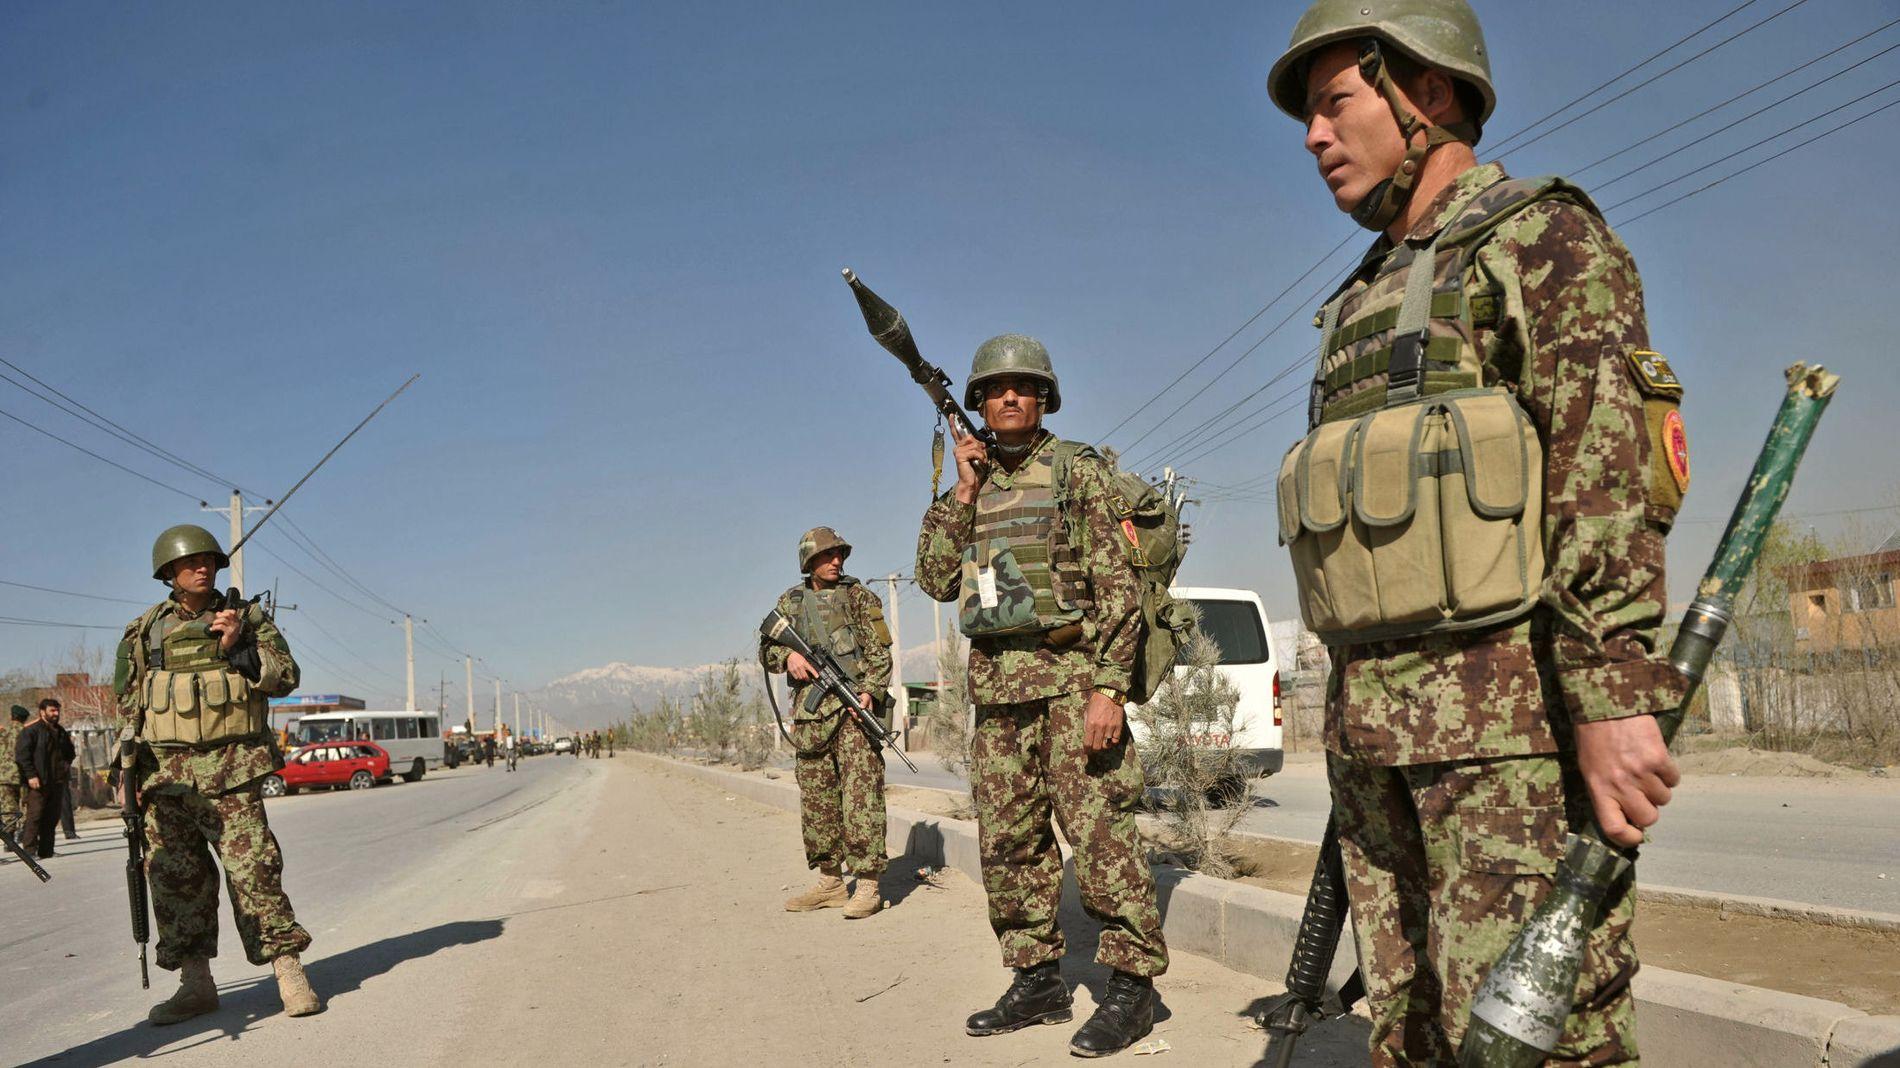 MULIGE BUDSJETTAPERE: Disse gutta patruljerer et område like utenfor USAs militære hovedbase i Kabul, Cap Phoenix.